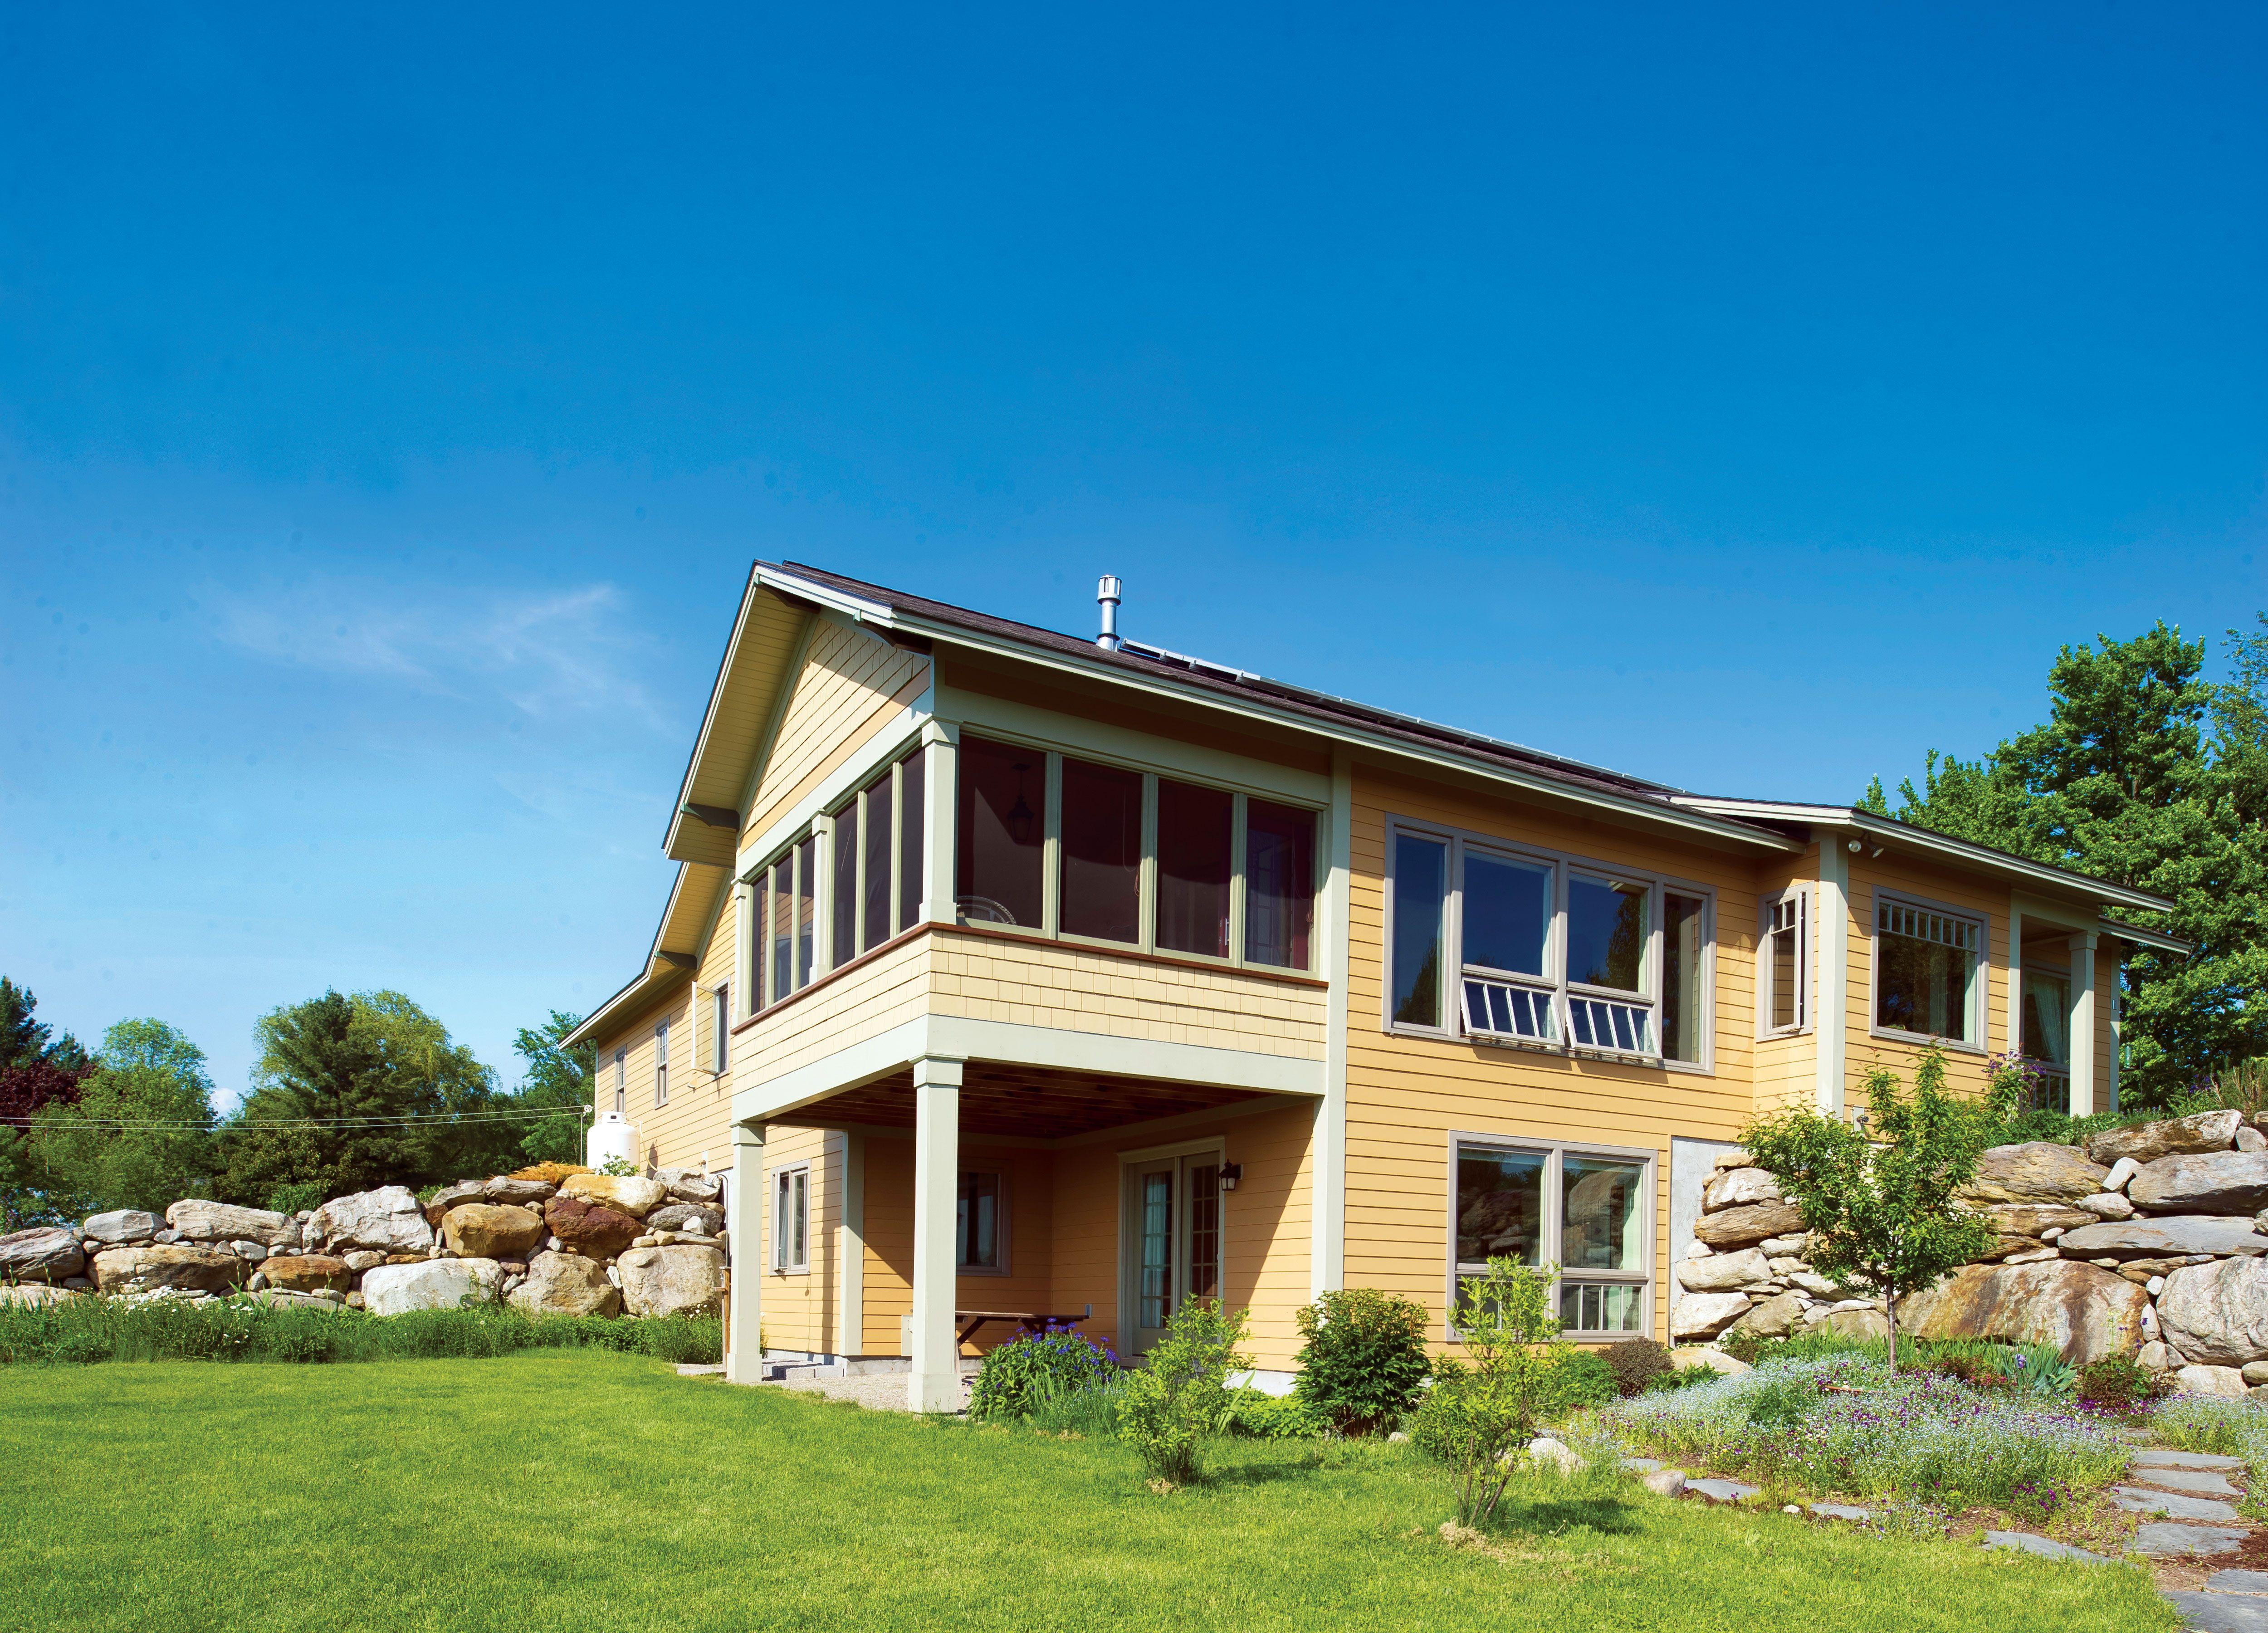 passive solar design: creating sun-inspired homes - green homes